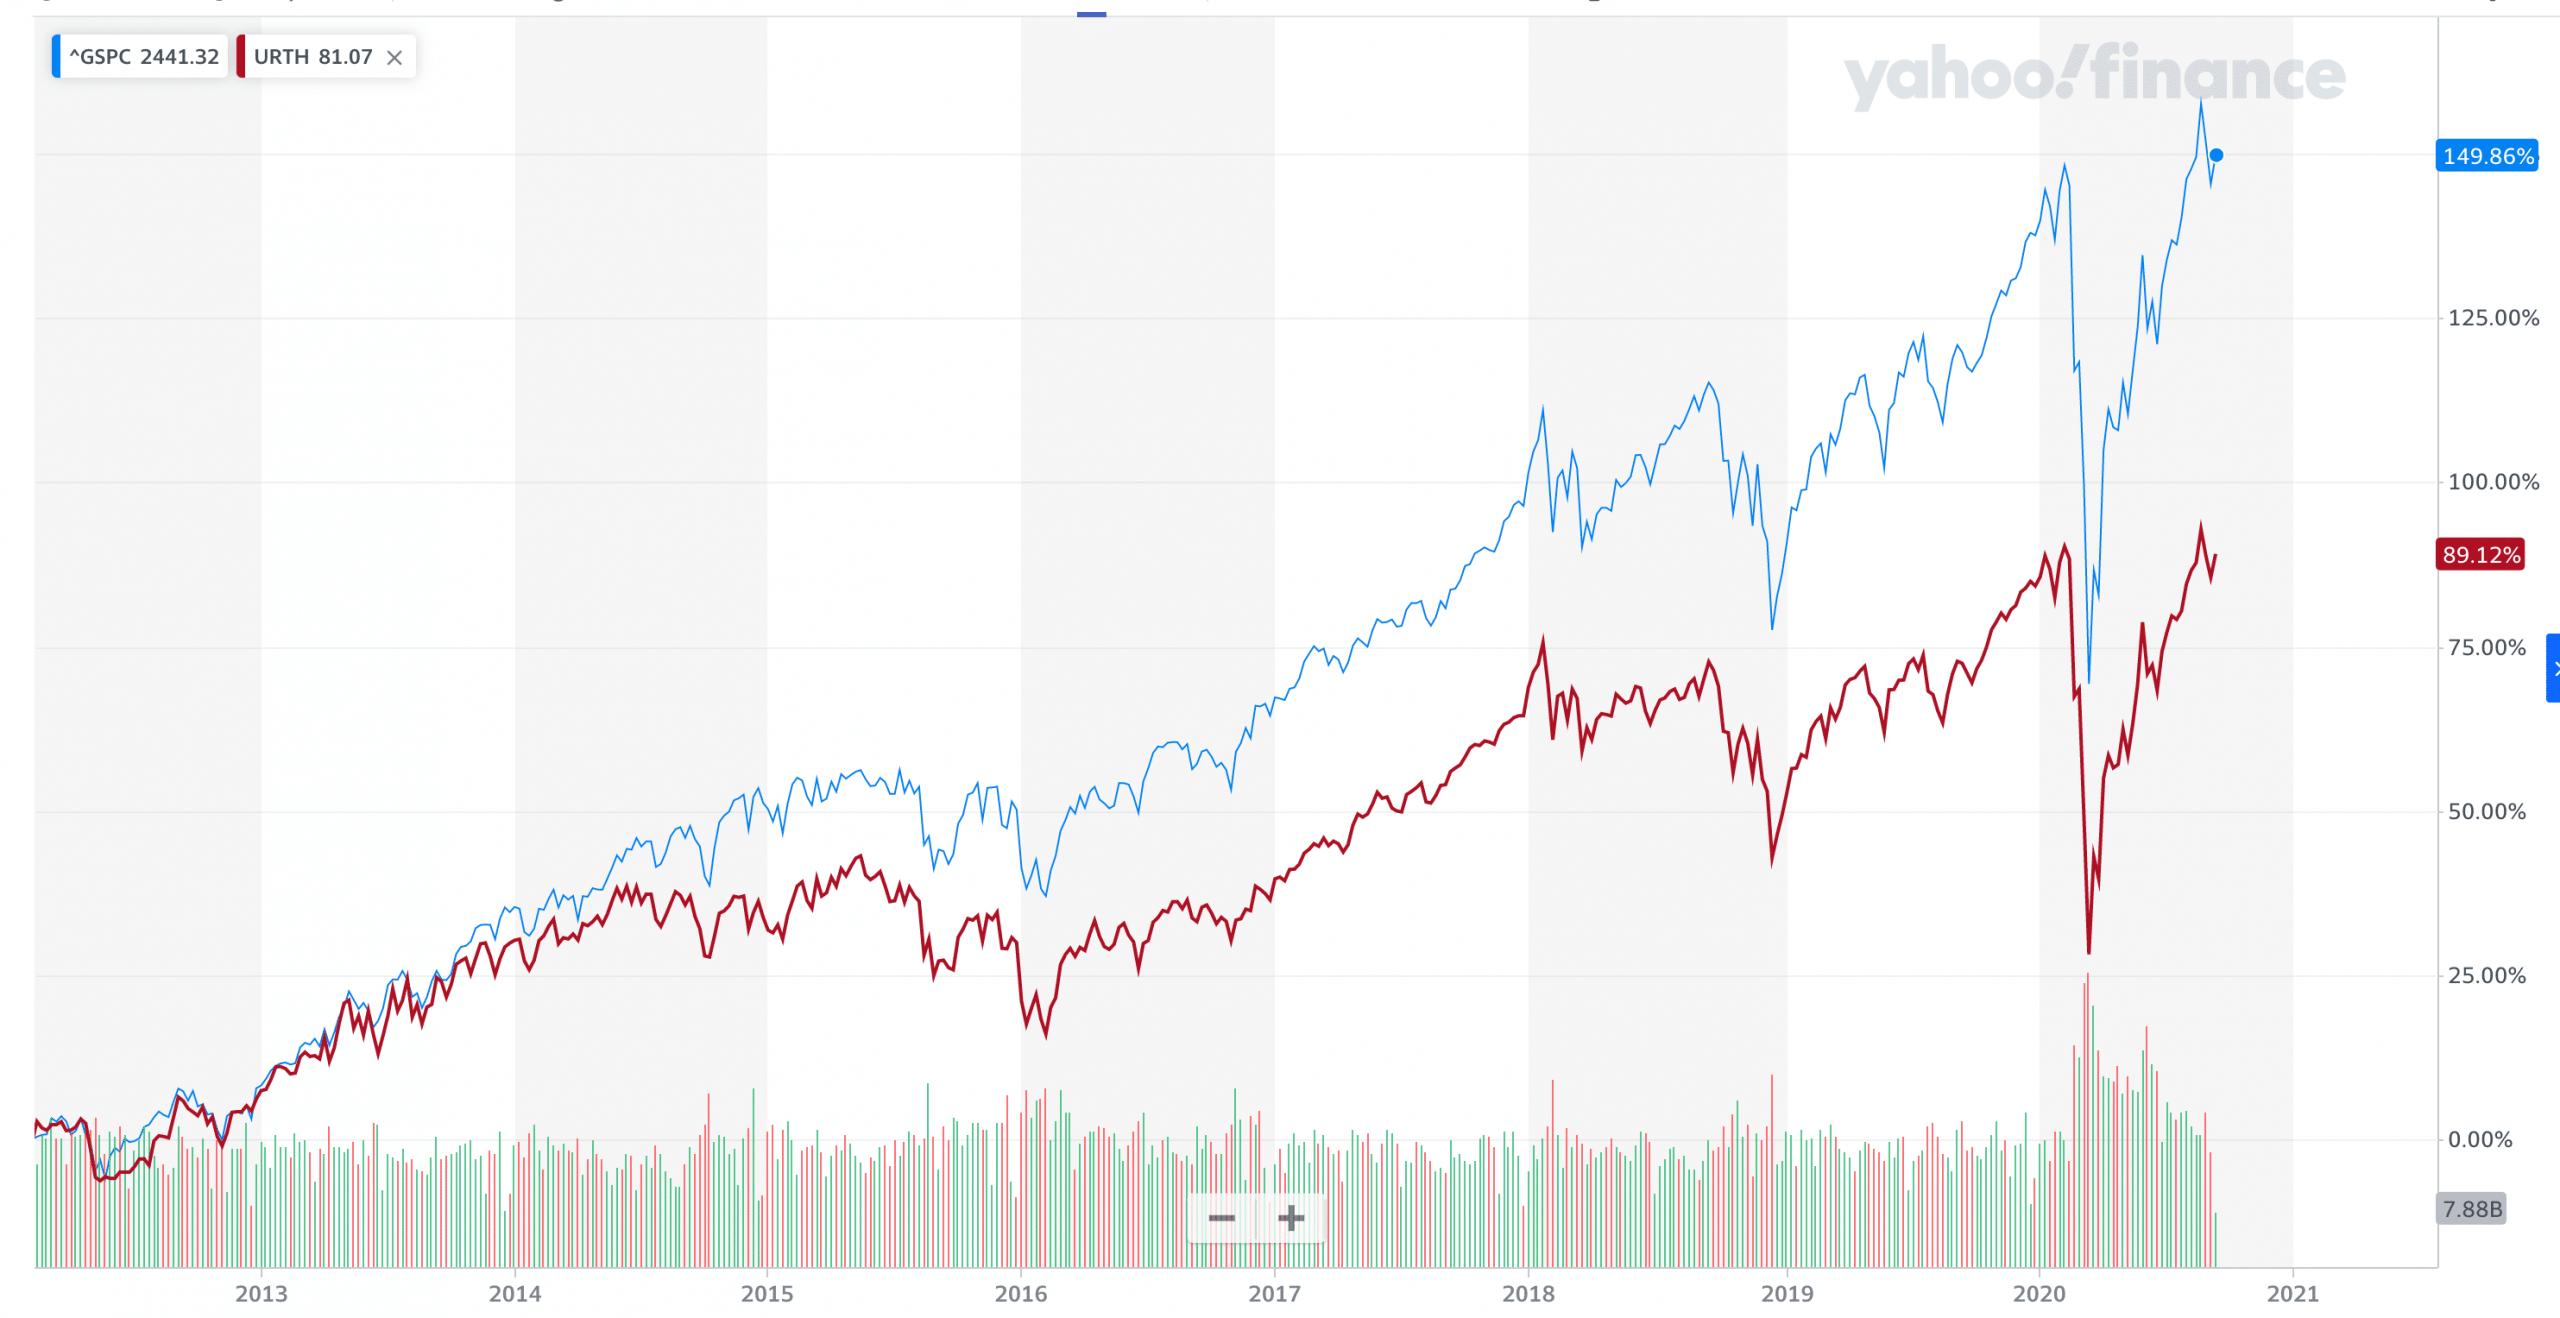 S&P500 VS MSCI WORLD